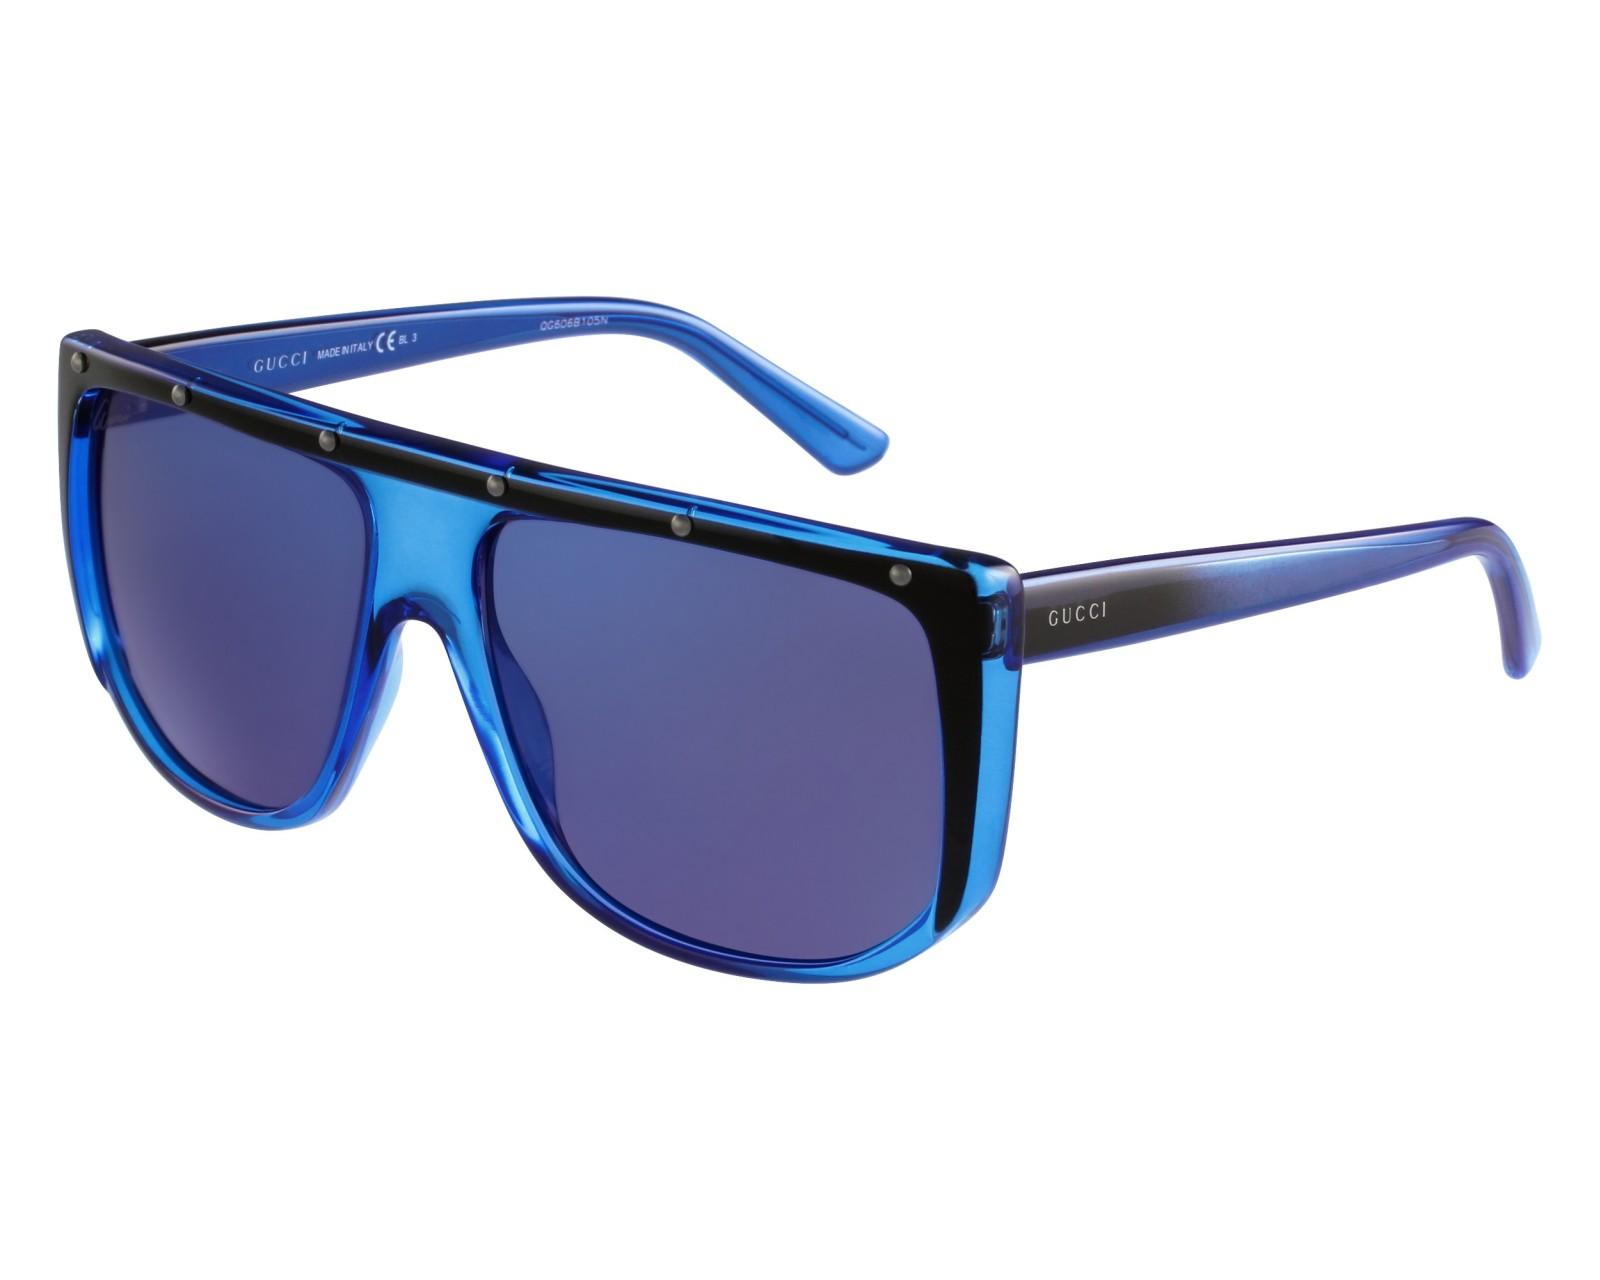 d76bcfca109 thumbnail Sunglasses Gucci GG-3705-S HXW XT - Blue Black front view